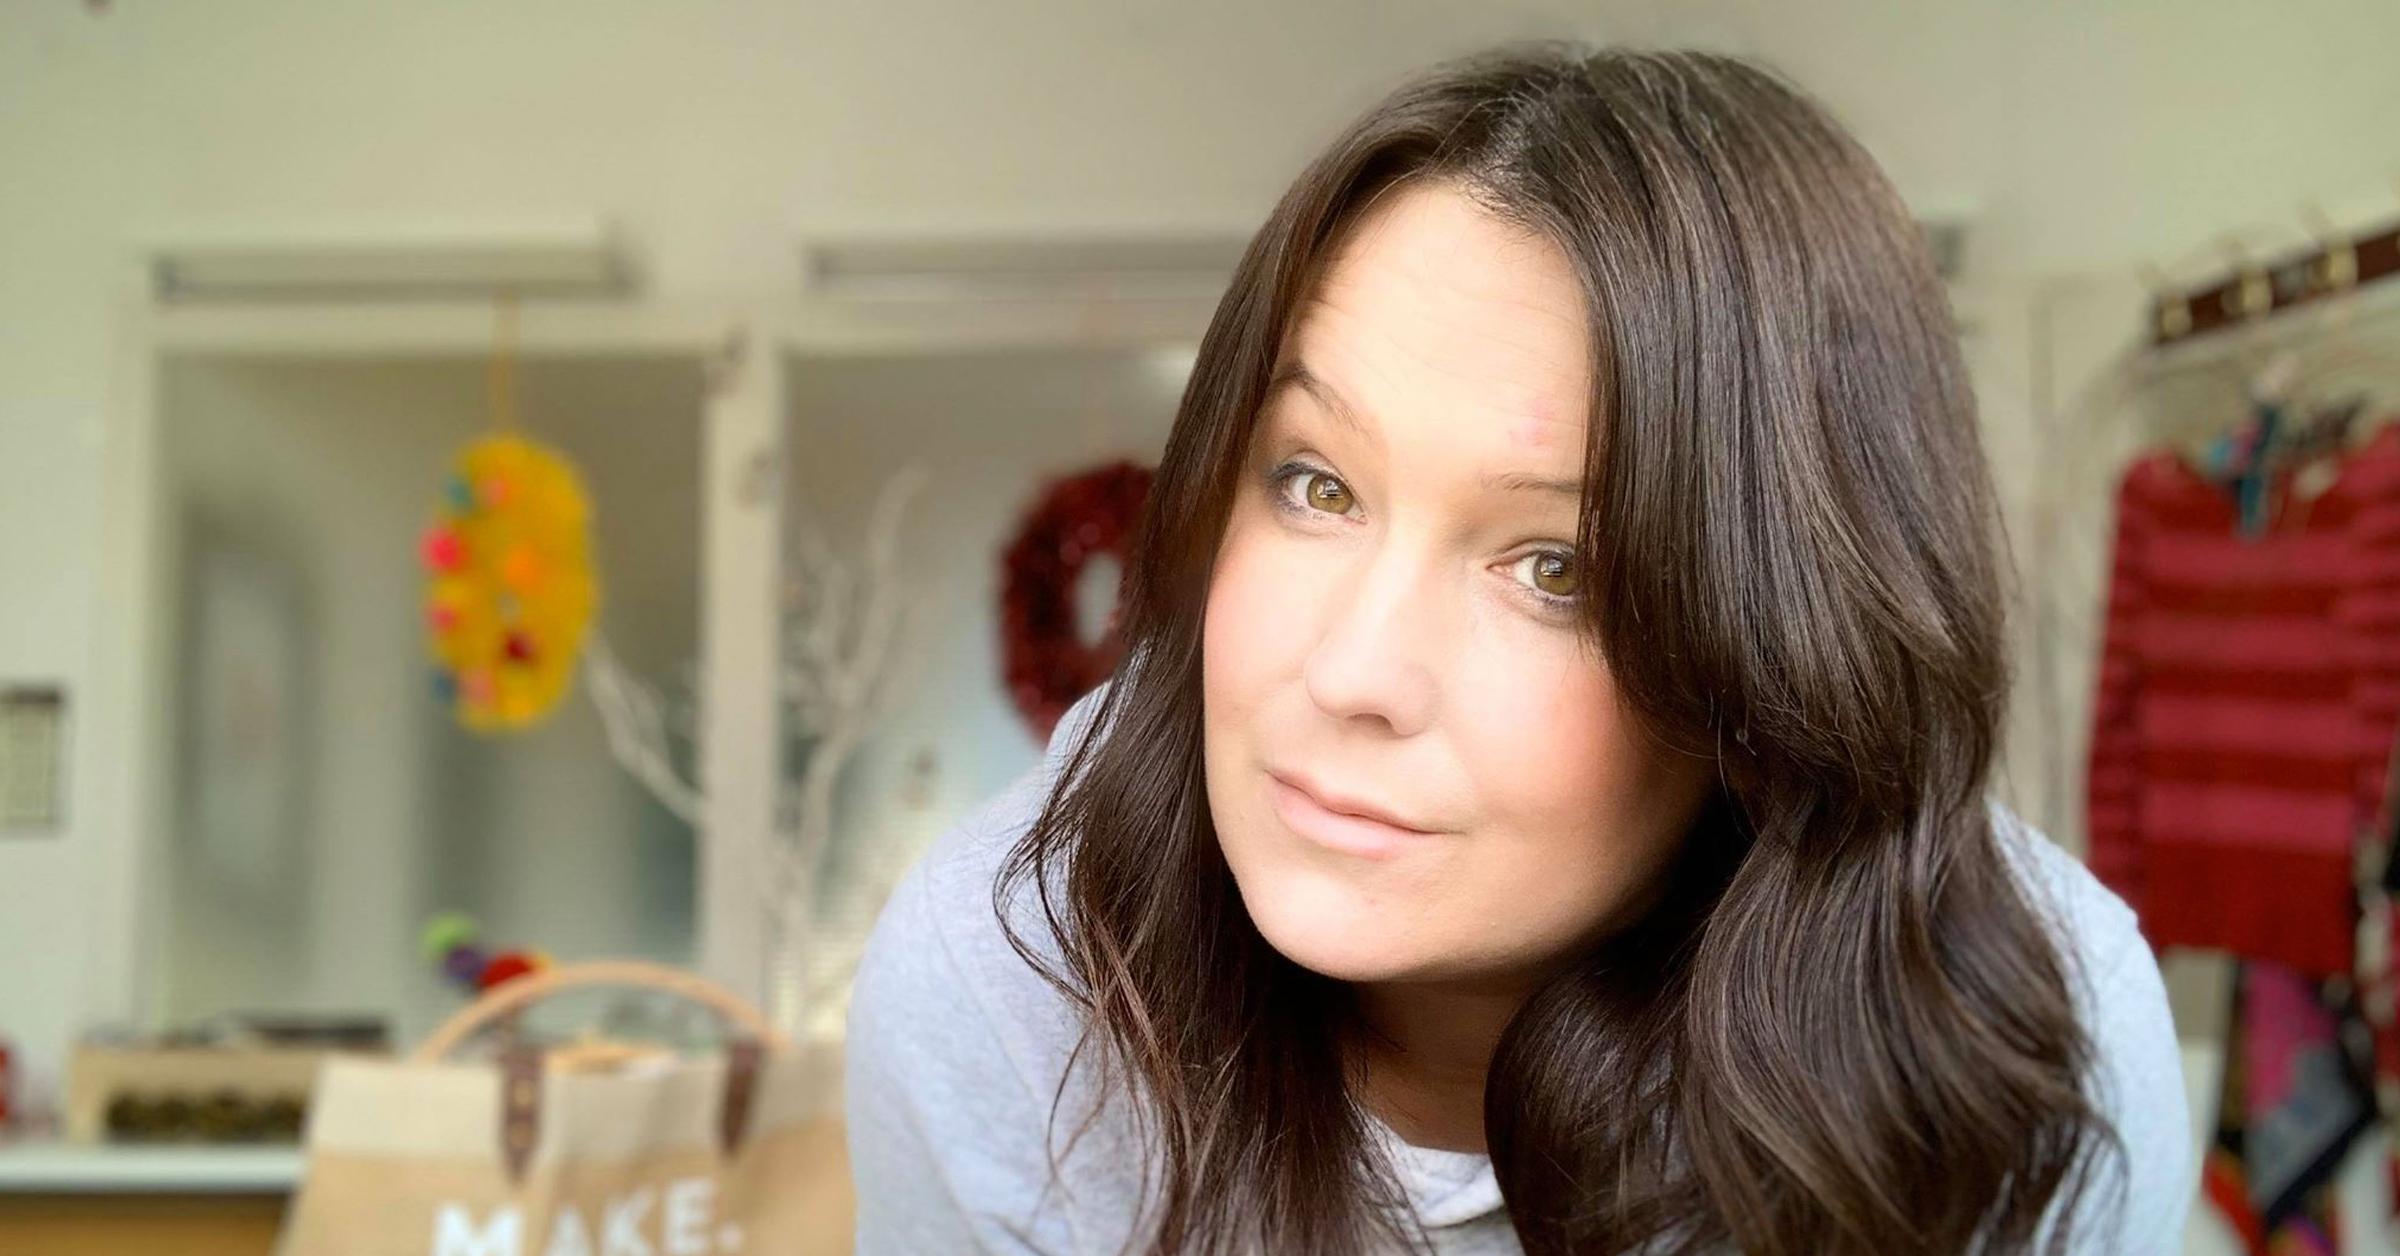 Craft & embroidery specialist, Gemma